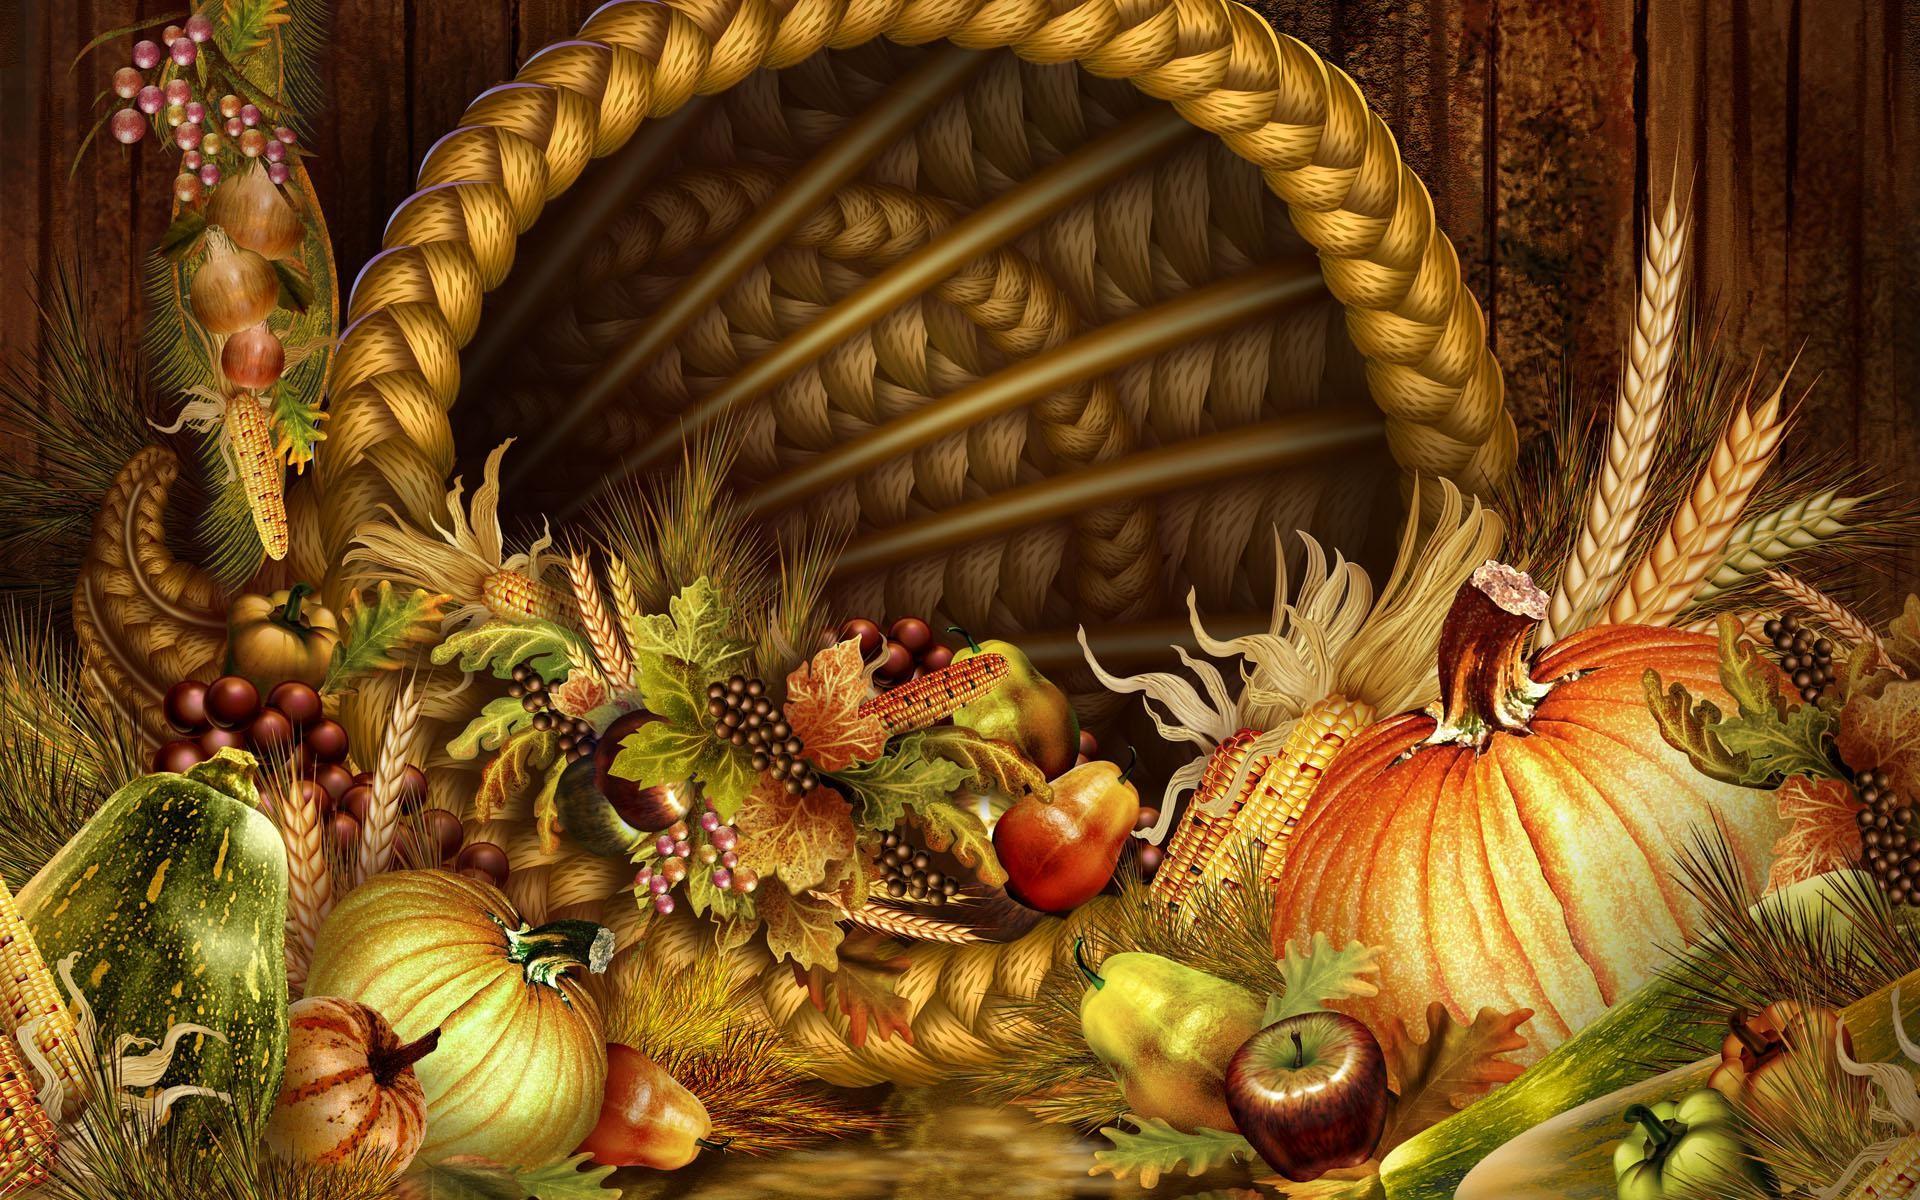 Holiday Thanksgiving Wallpaper HD.